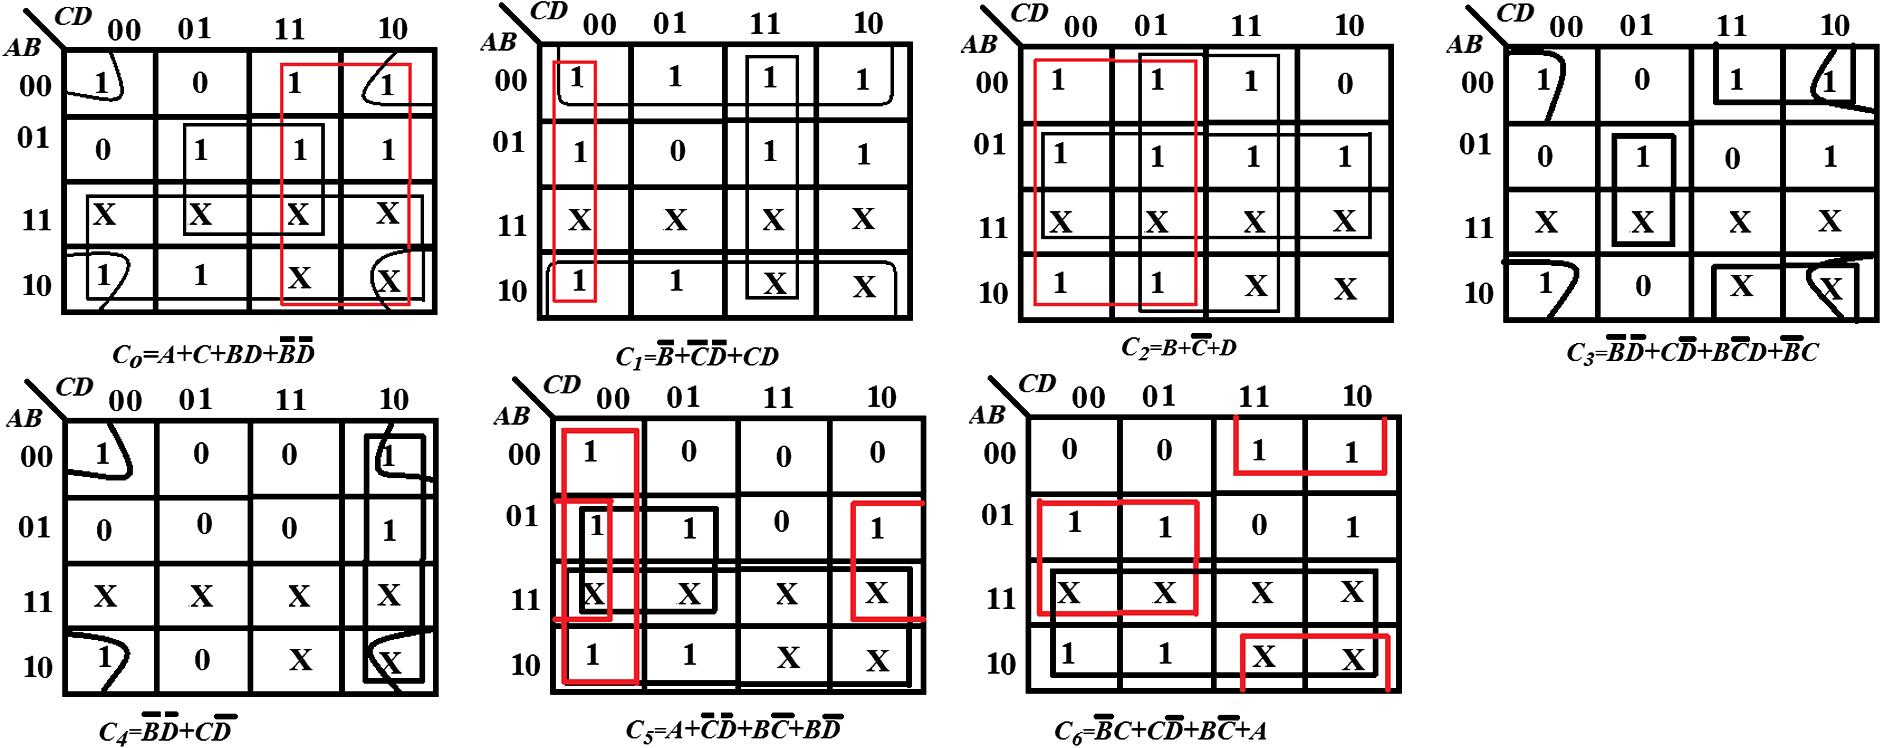 Design Of Optical Seven Segment Decoder Using Pockels Effect Inside And Tutorials Digital Systems Part 4 For 7segment Display K Map Output C0c1c2c3c4c5 C 0 1 2 3 5 C6 6